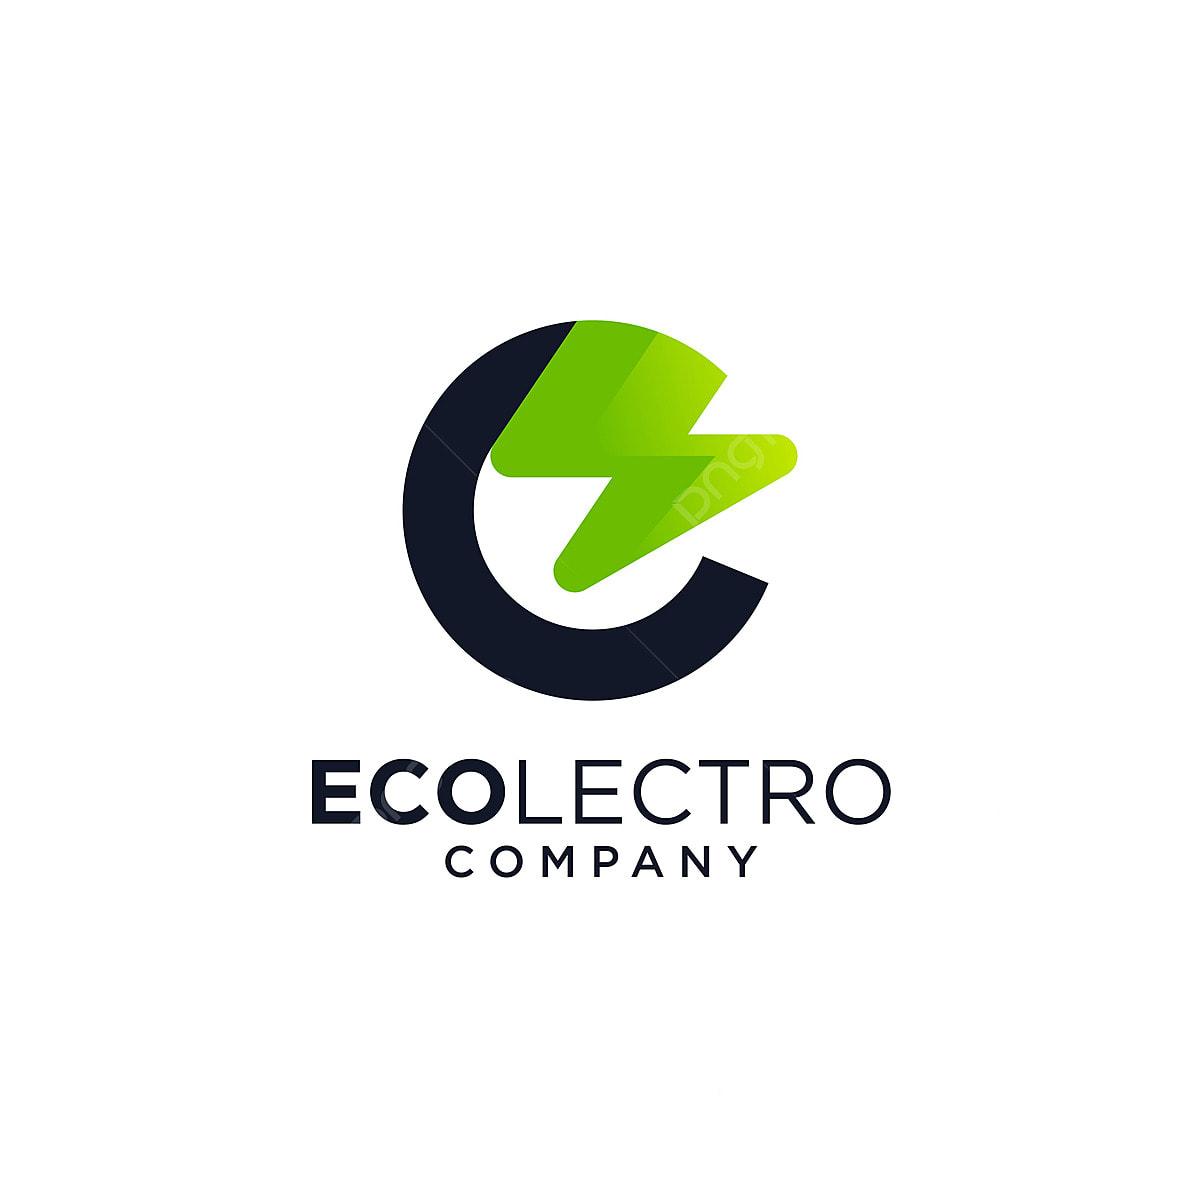 e letter logo design with lighting thunder vector illustration template for free download on pngtree e letter logo design with lighting